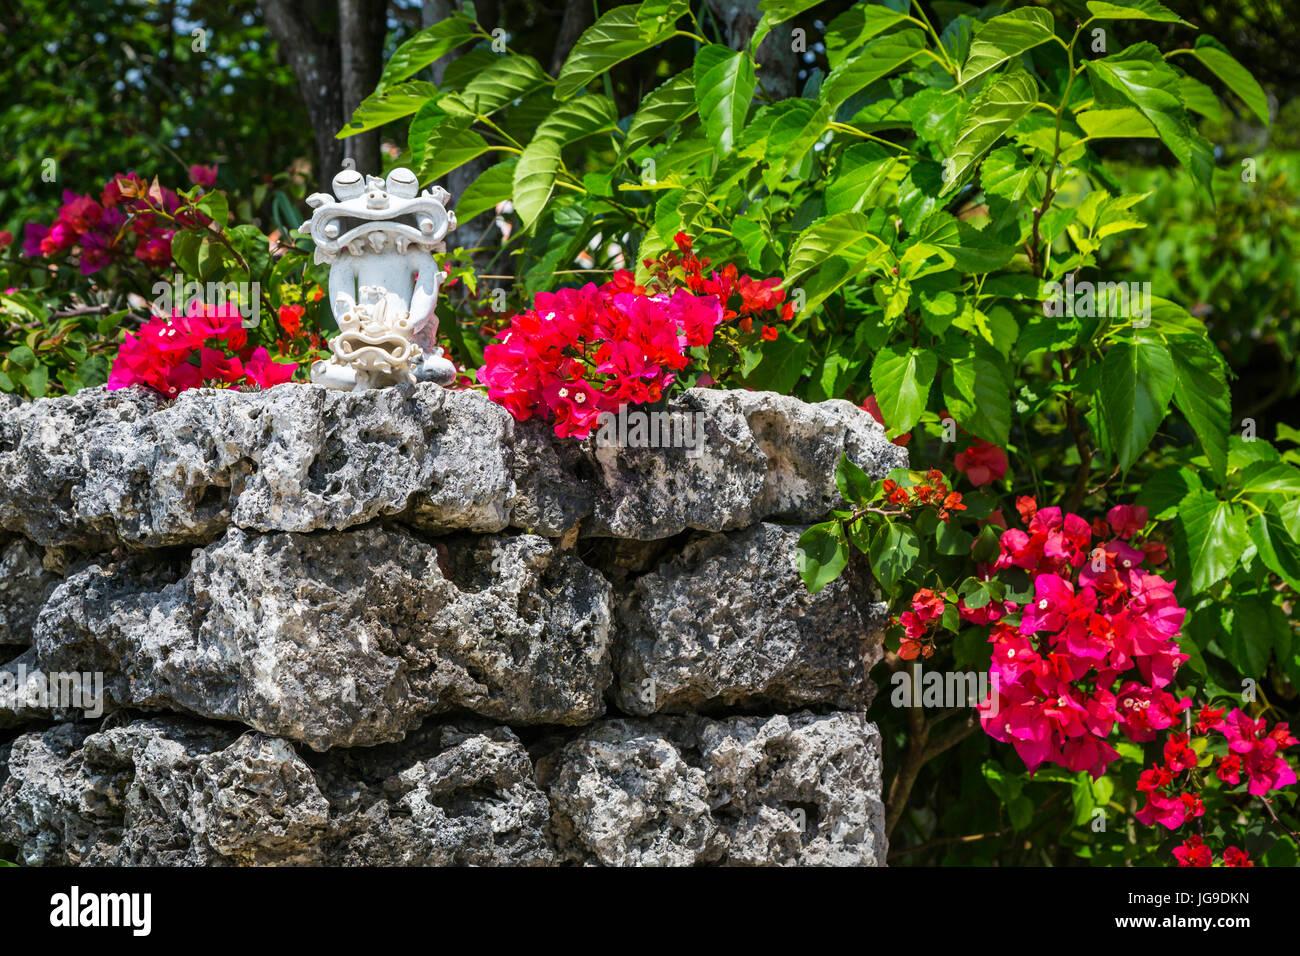 on Taketomi Island, Okinawa Prefecture, Japan. - Stock Image